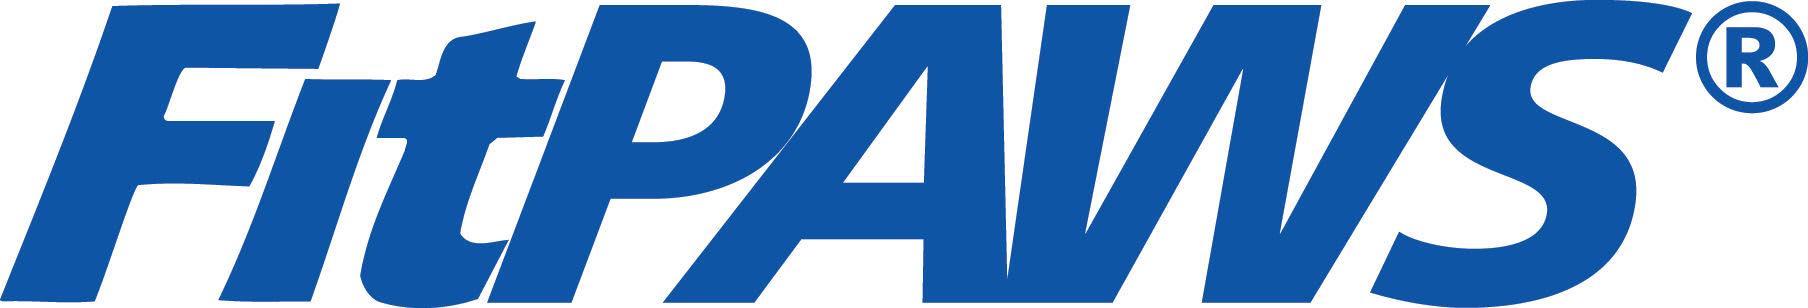 MAK9_Fitpaws logo